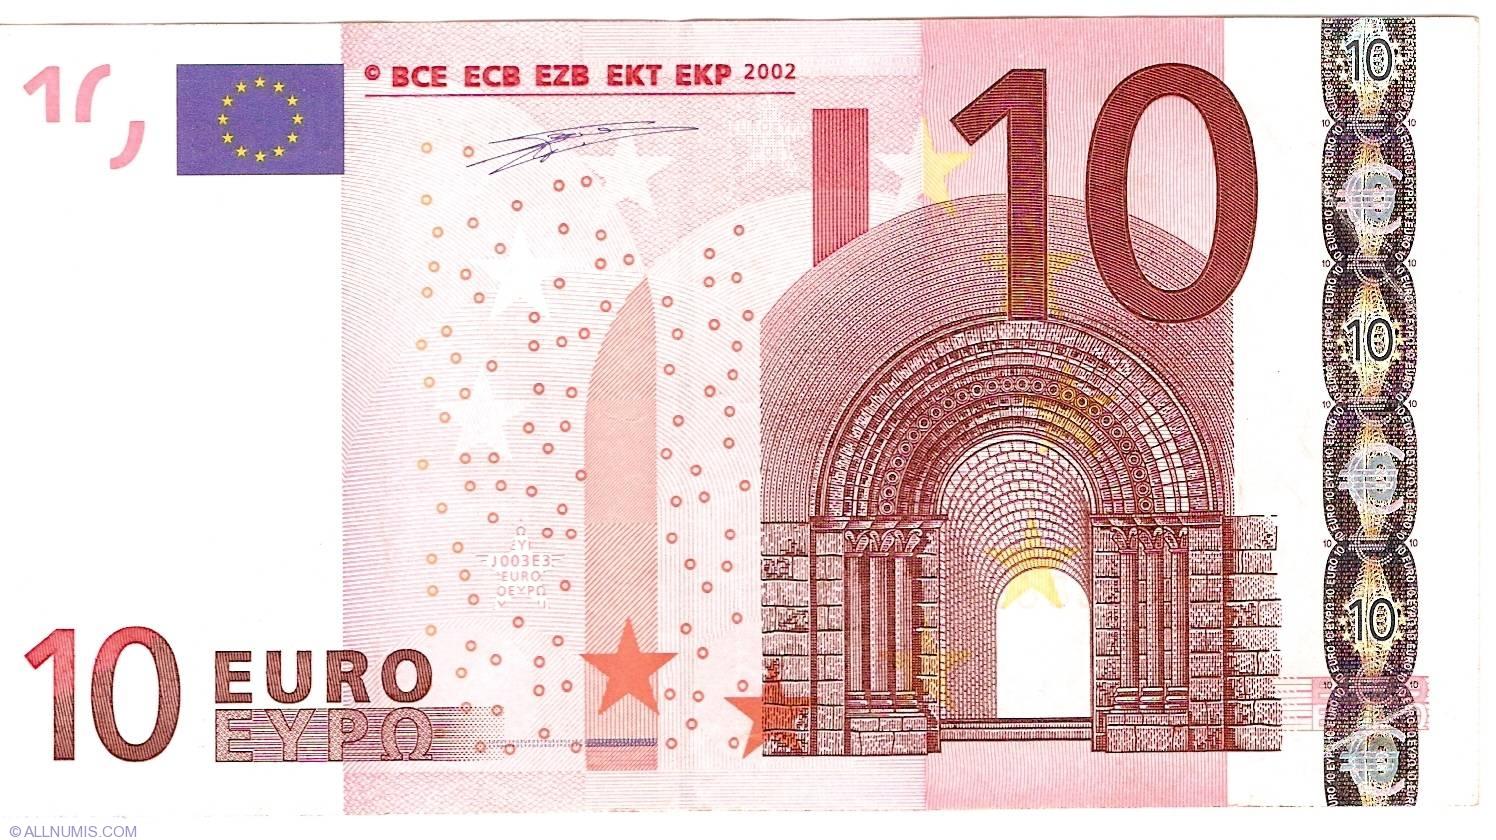 10 Euro 2002 S Italy 2002 Issue 10 Euro Signature